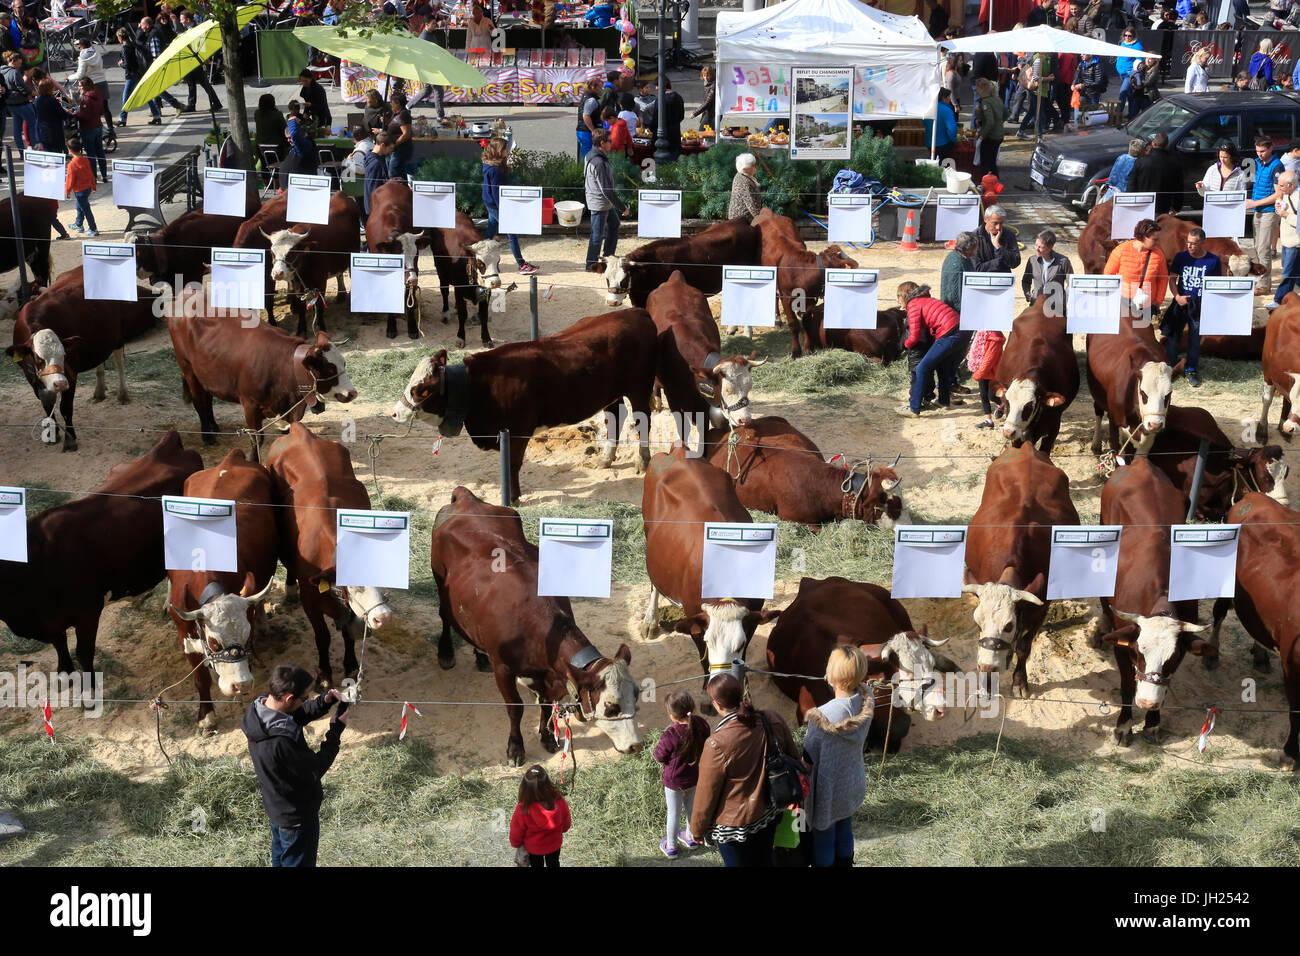 The agriculture fair (Comice Agricole) of Saint-Gervais-les-Bains. France. - Stock Image